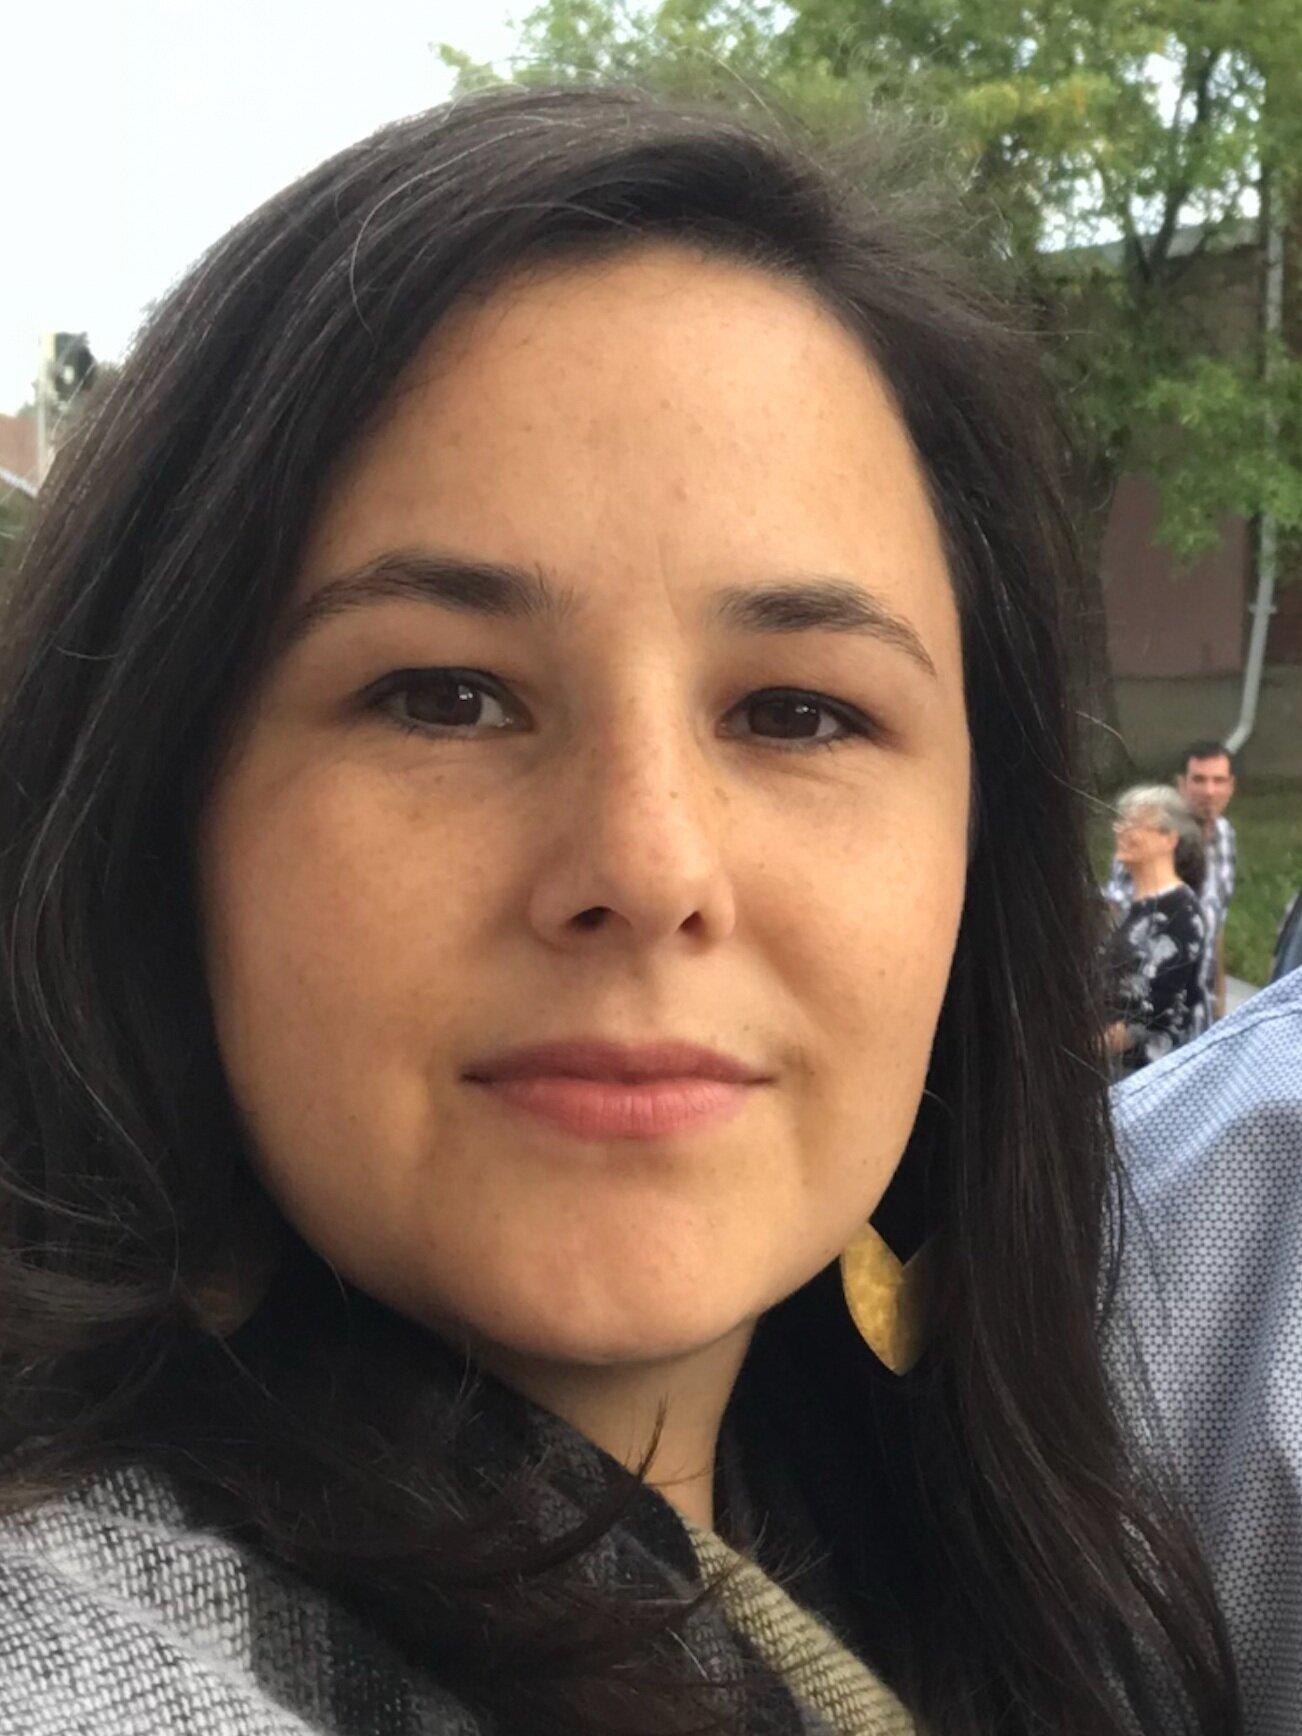 Erika Iserhoff - Officer, Indigenous ArtsEIserhoff@arts.on.ca